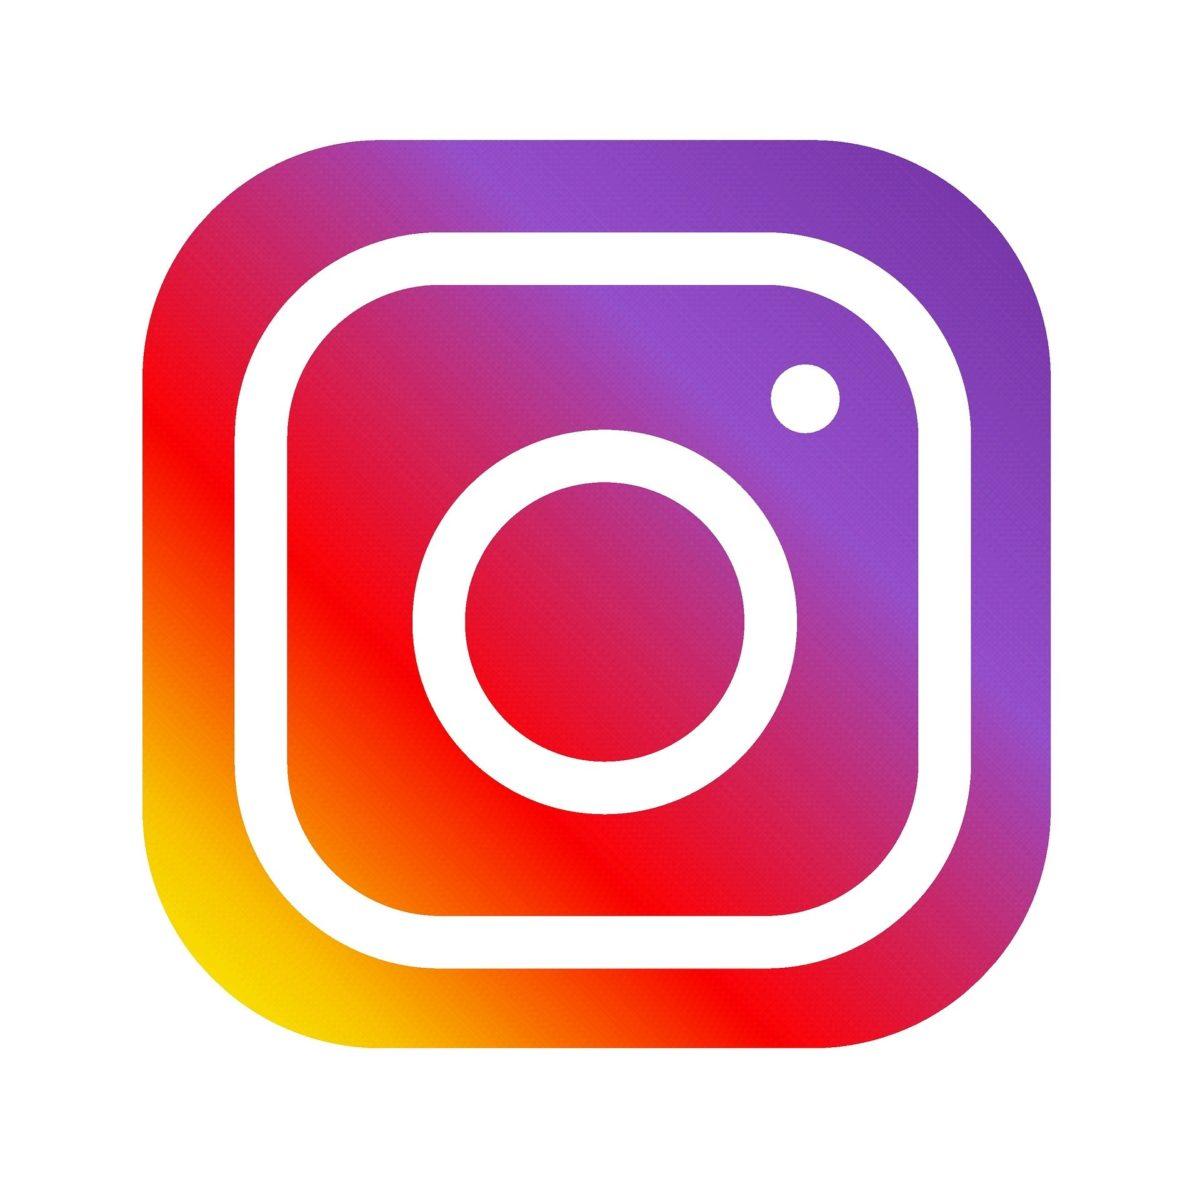 instagram-1581266_1920-1200x1191